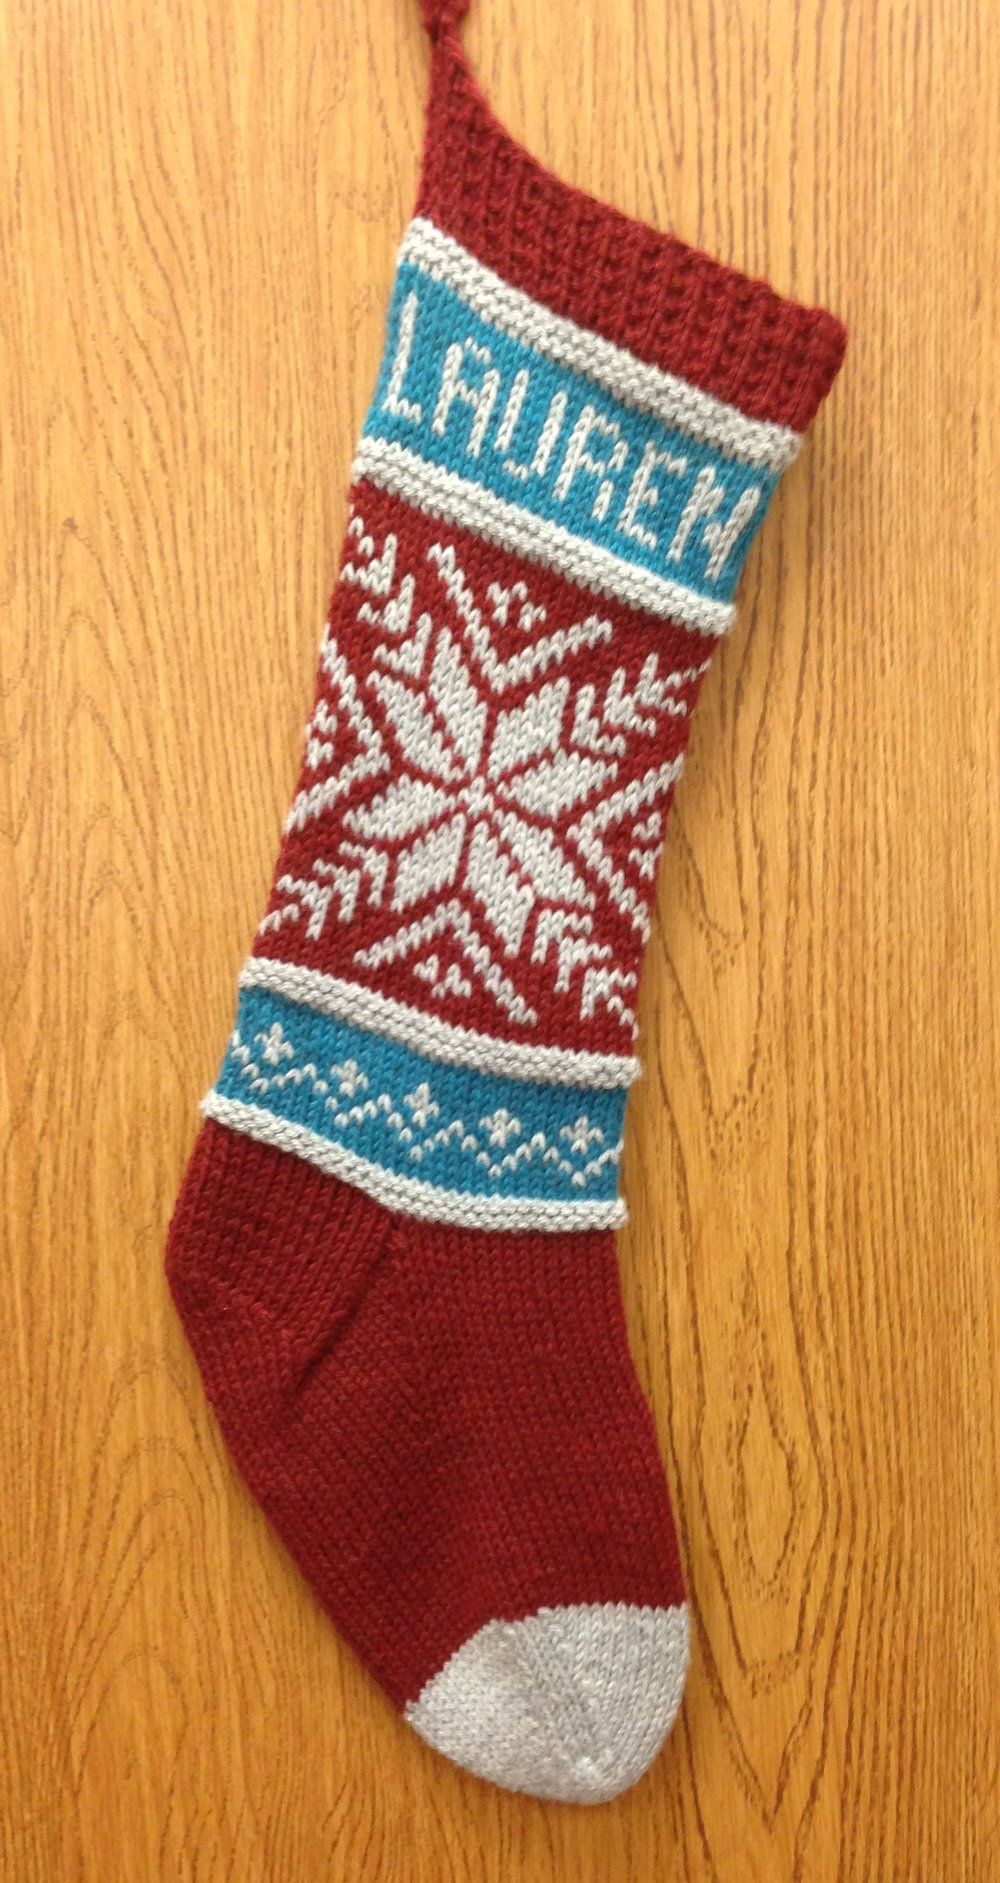 Christmas Stocking.jpg